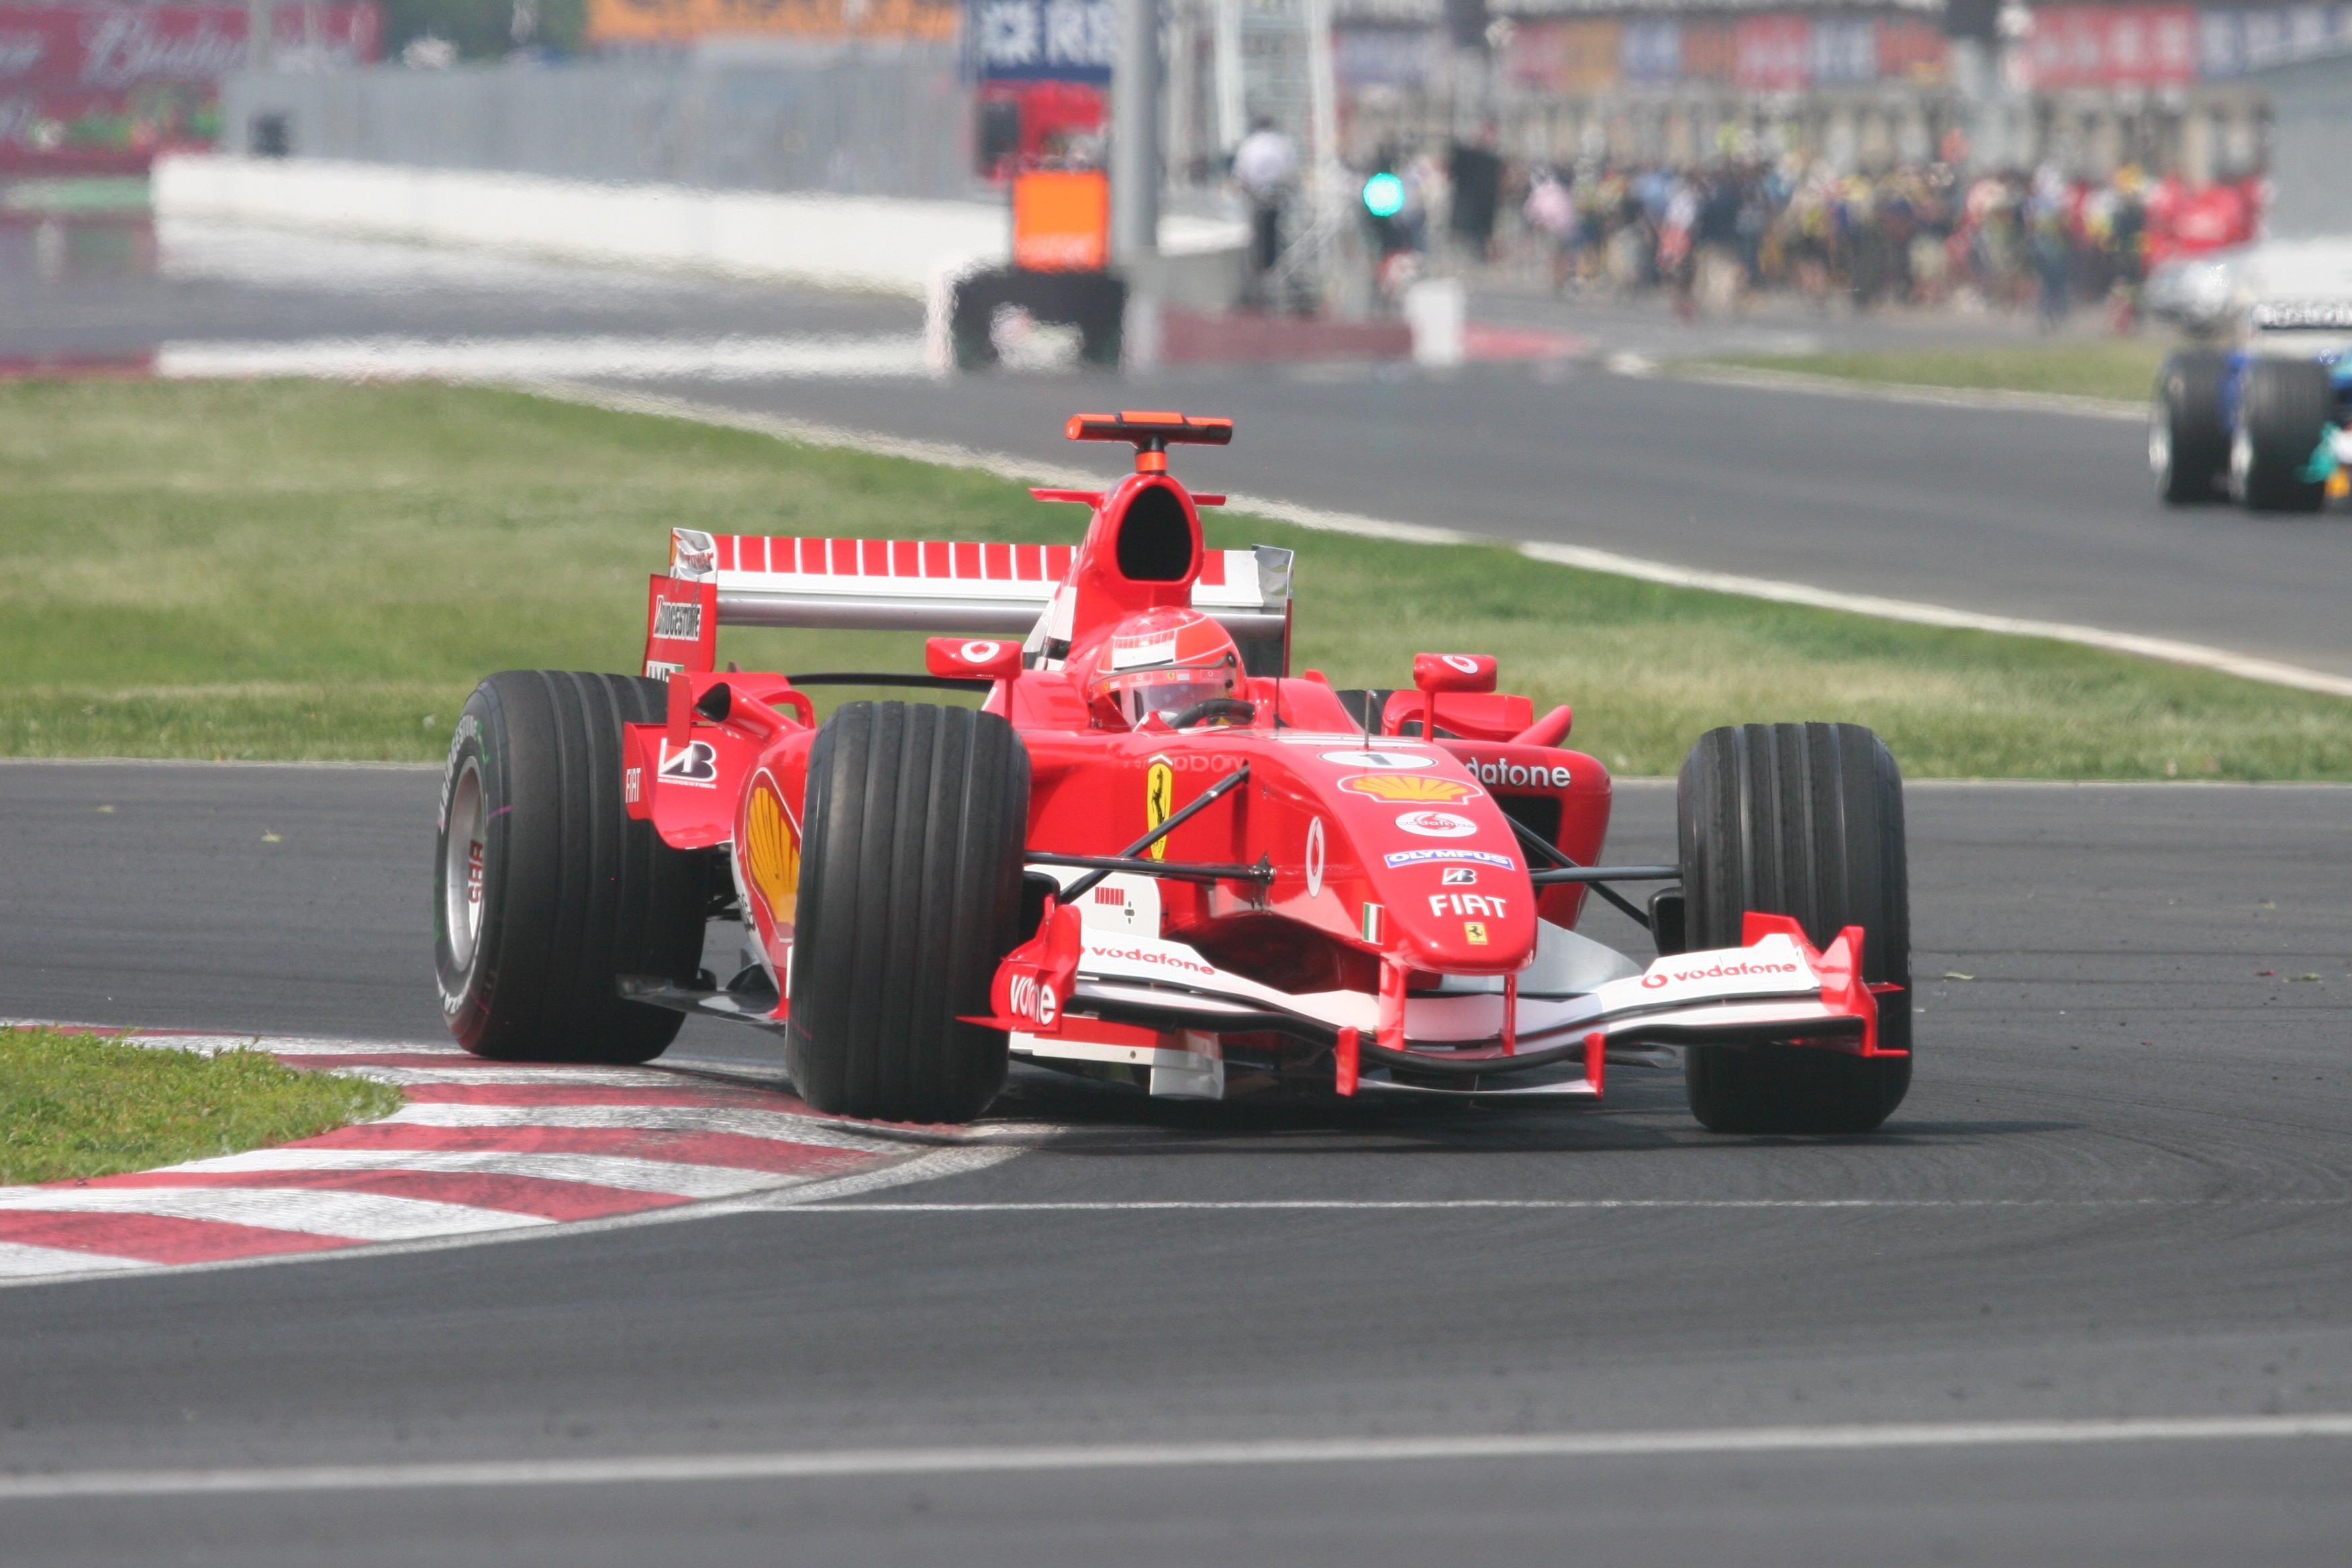 Description Michael Schumacher 2005 Canadajpg 3504x2336